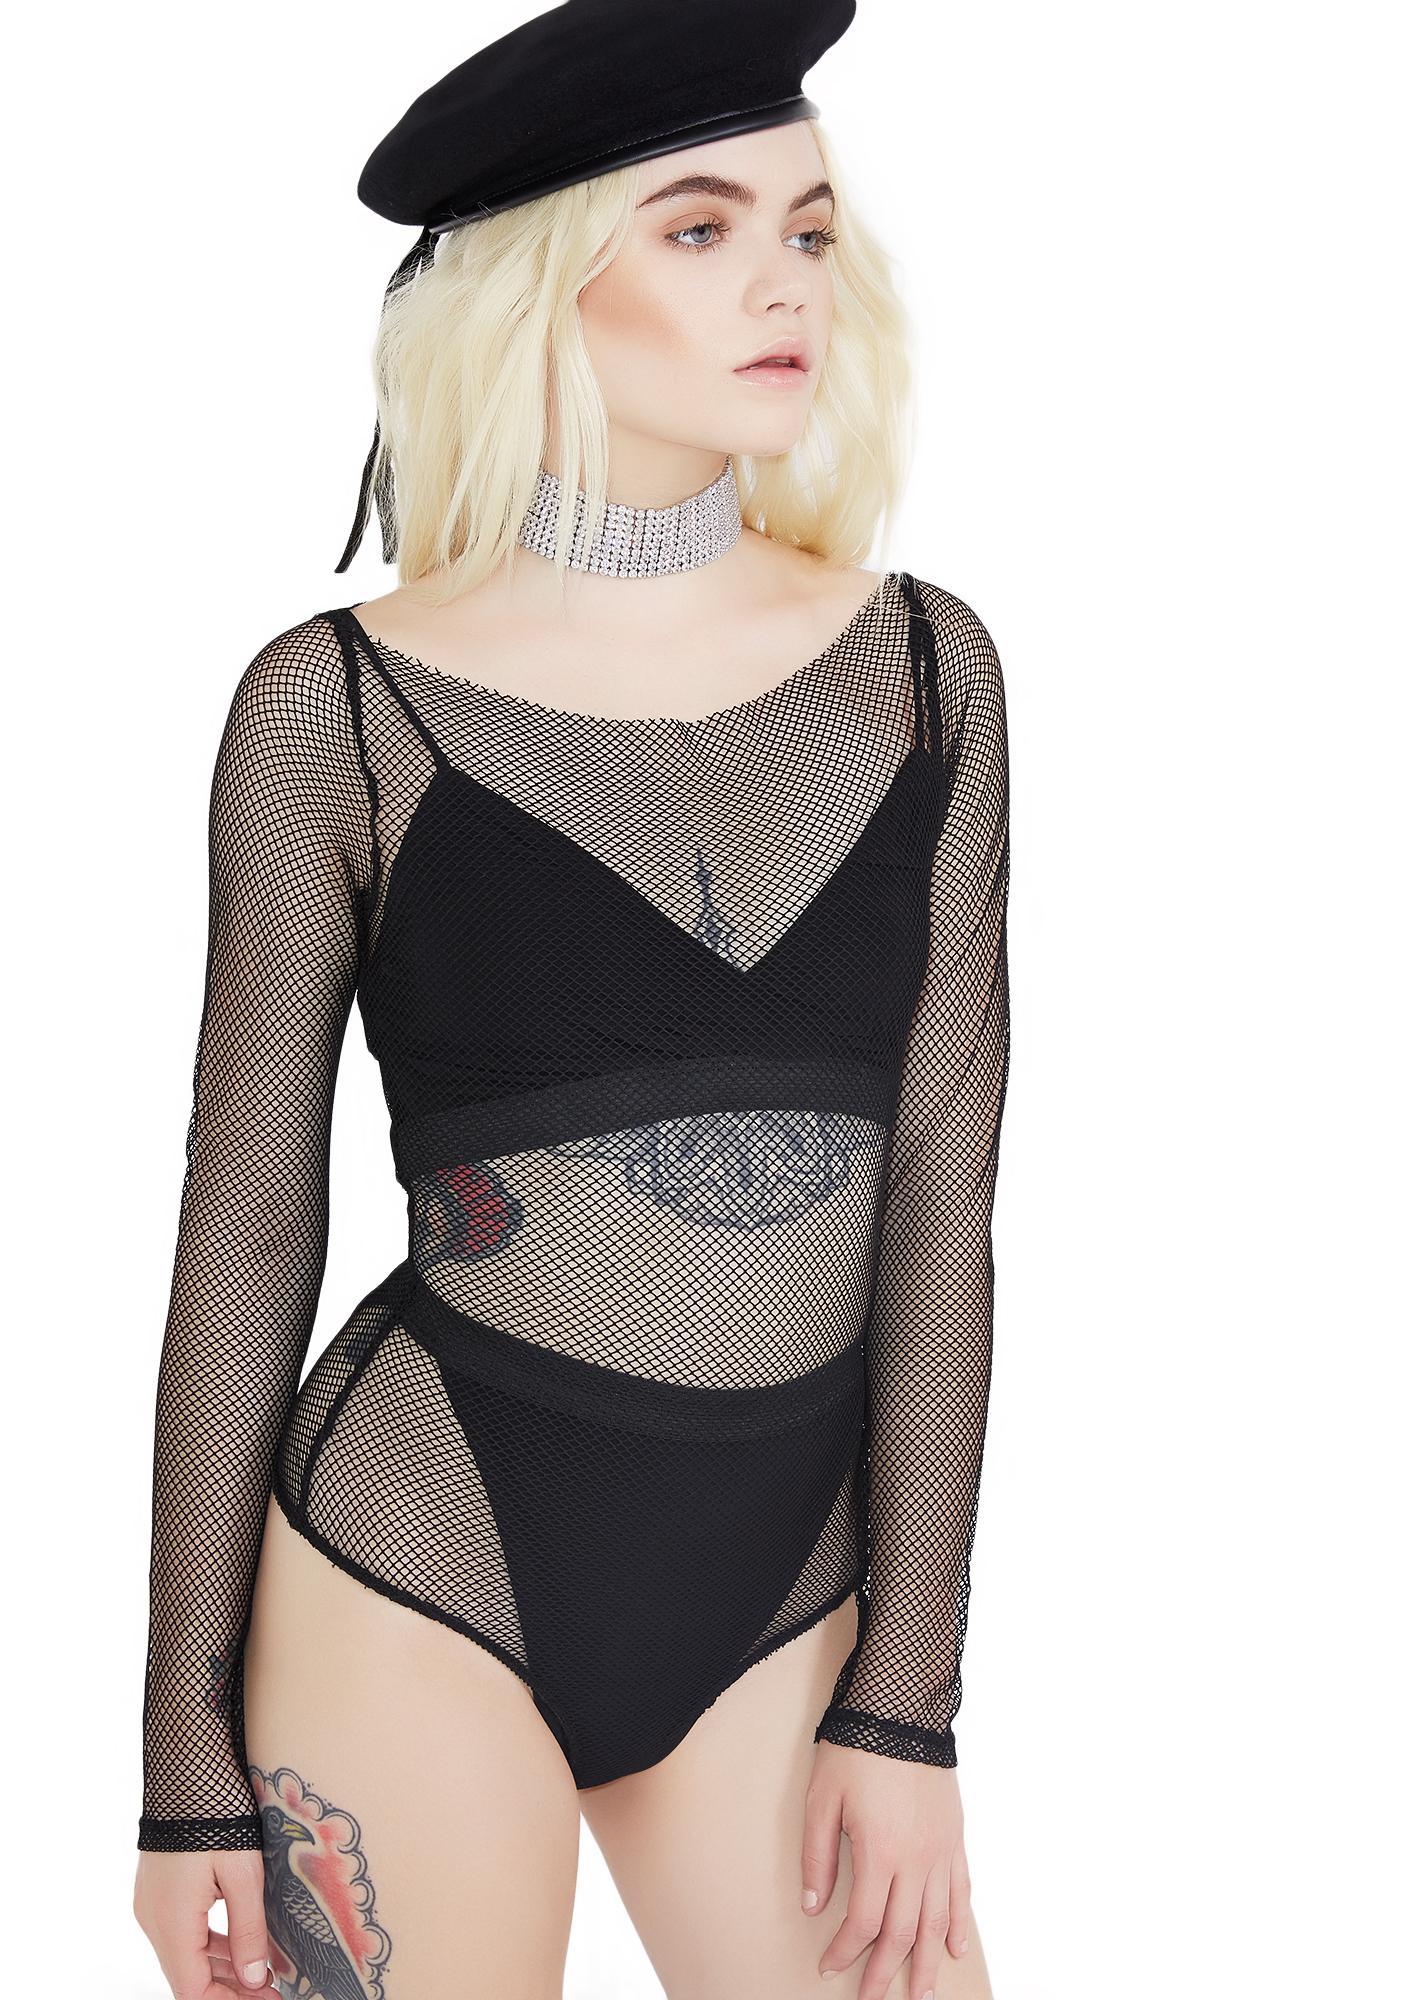 So Enticing Fishnet Bodysuit